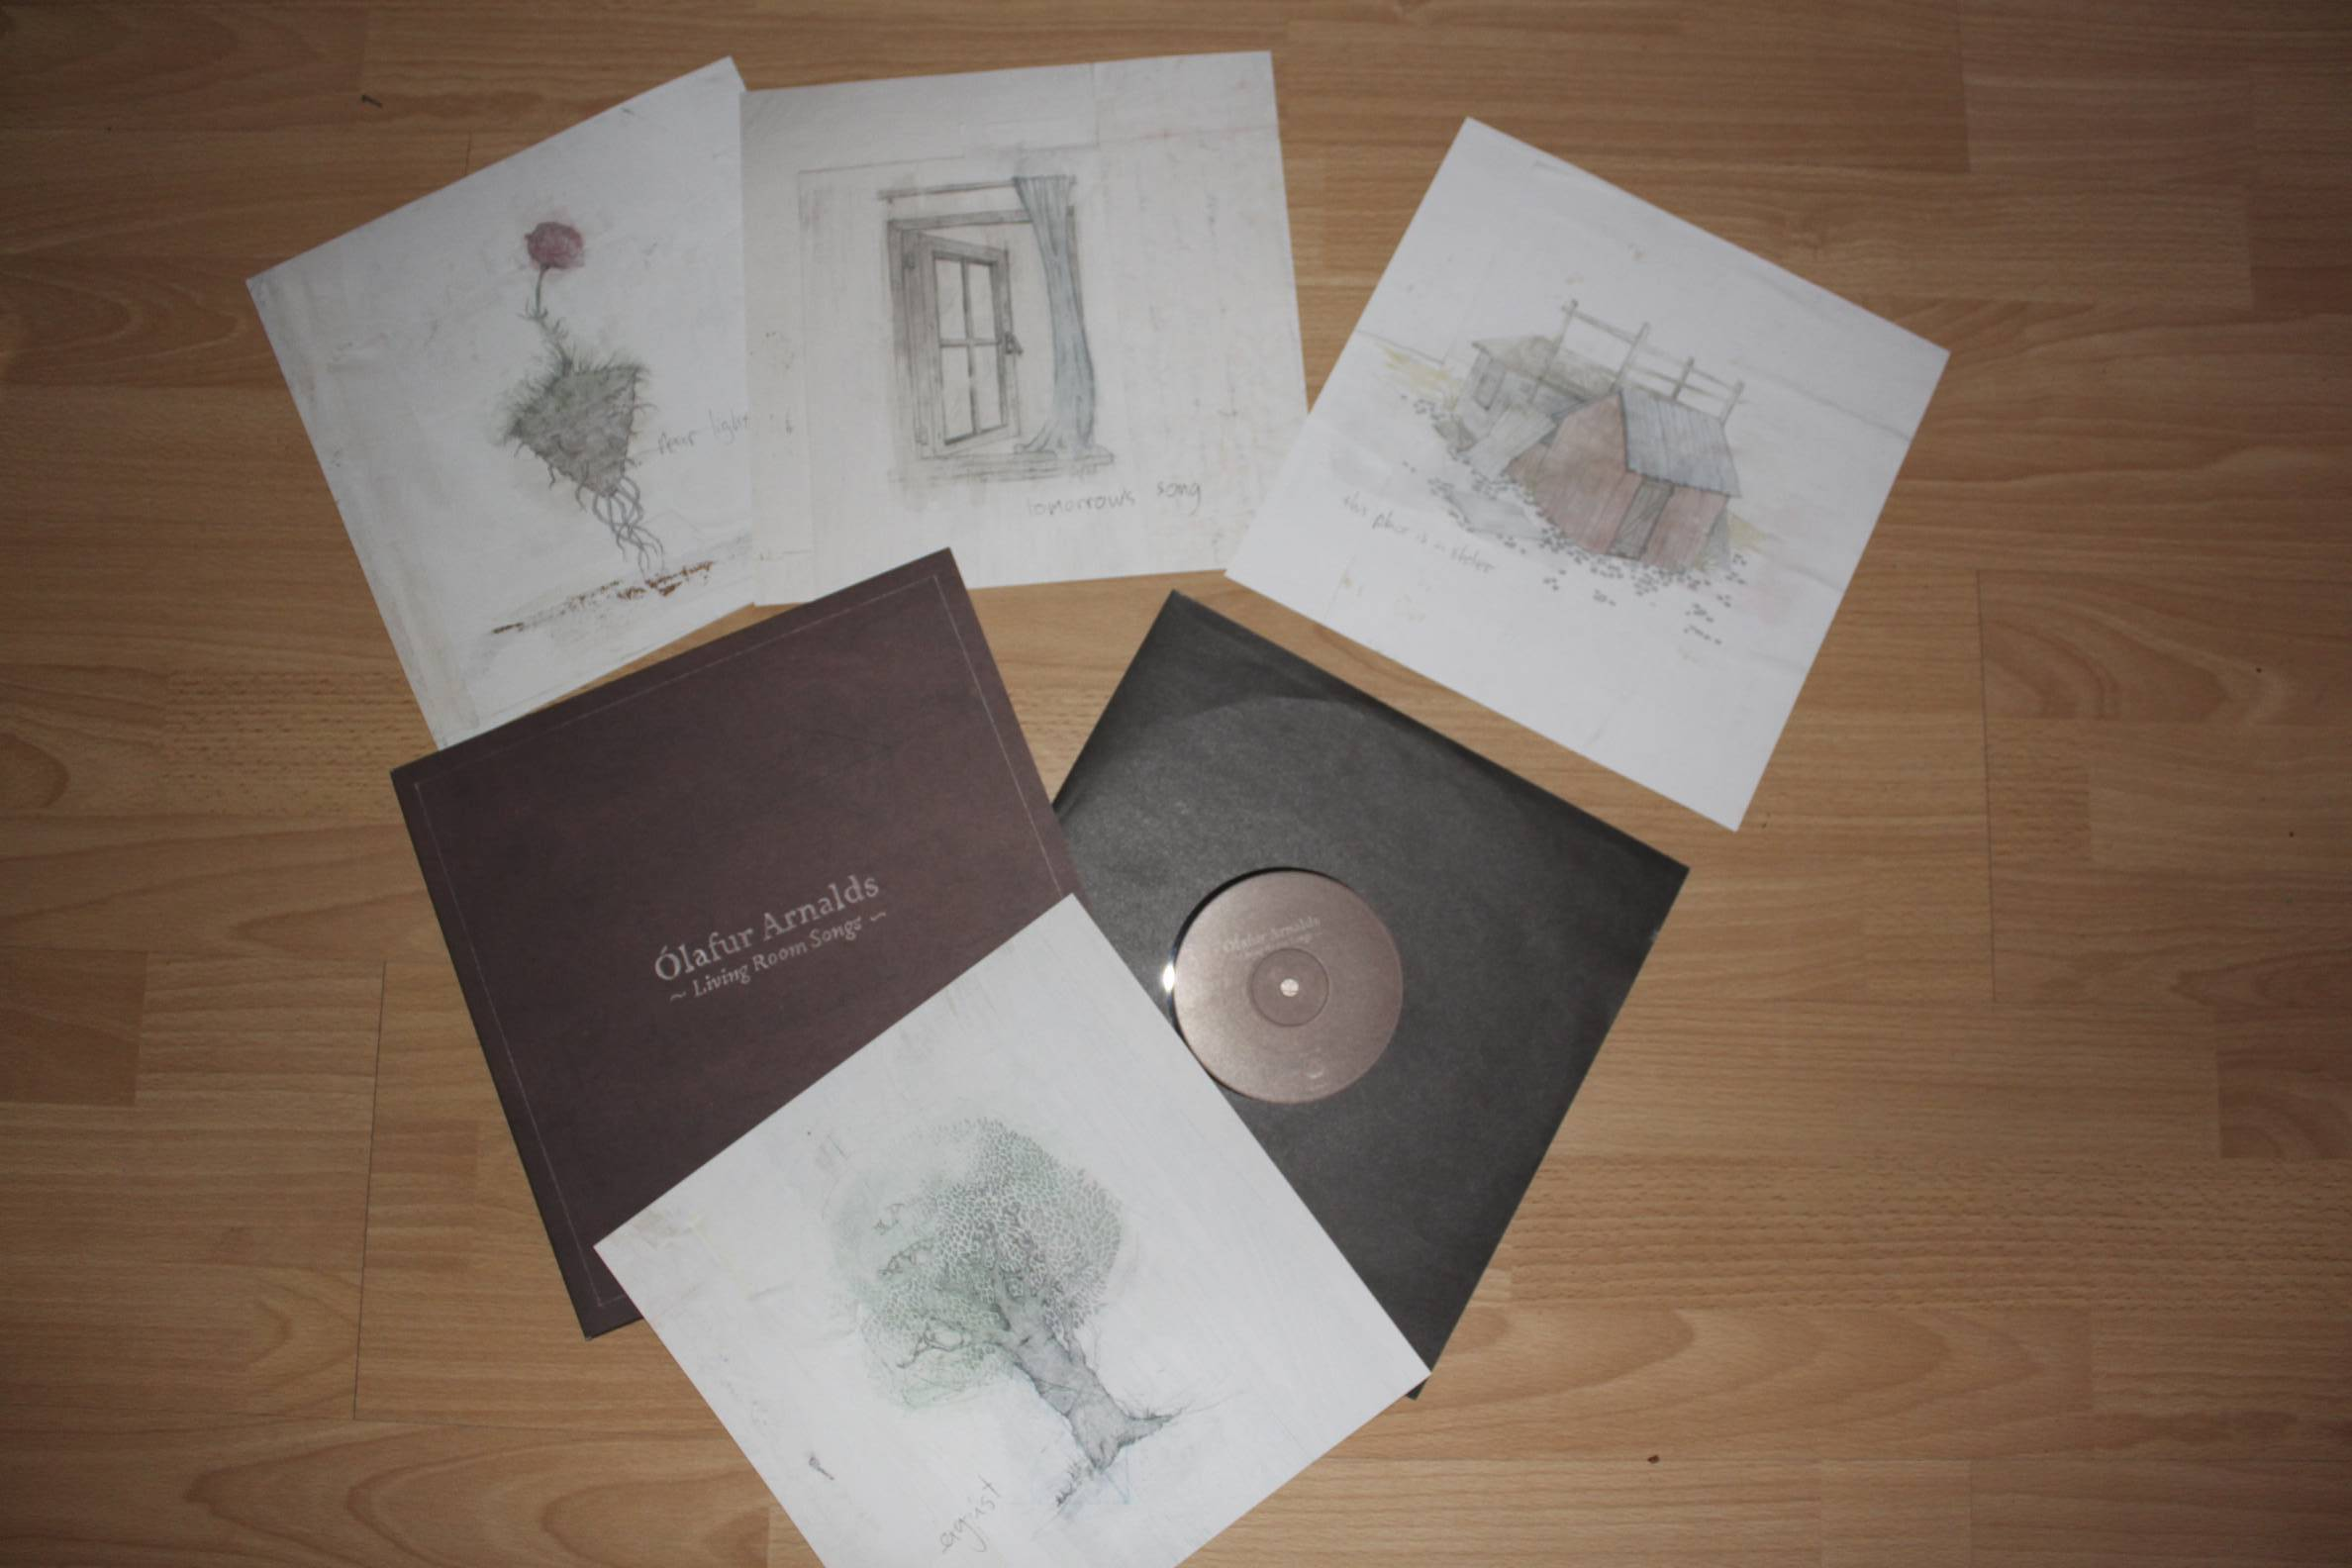 Ólafur Arnalds Living Room Songs Vinyl